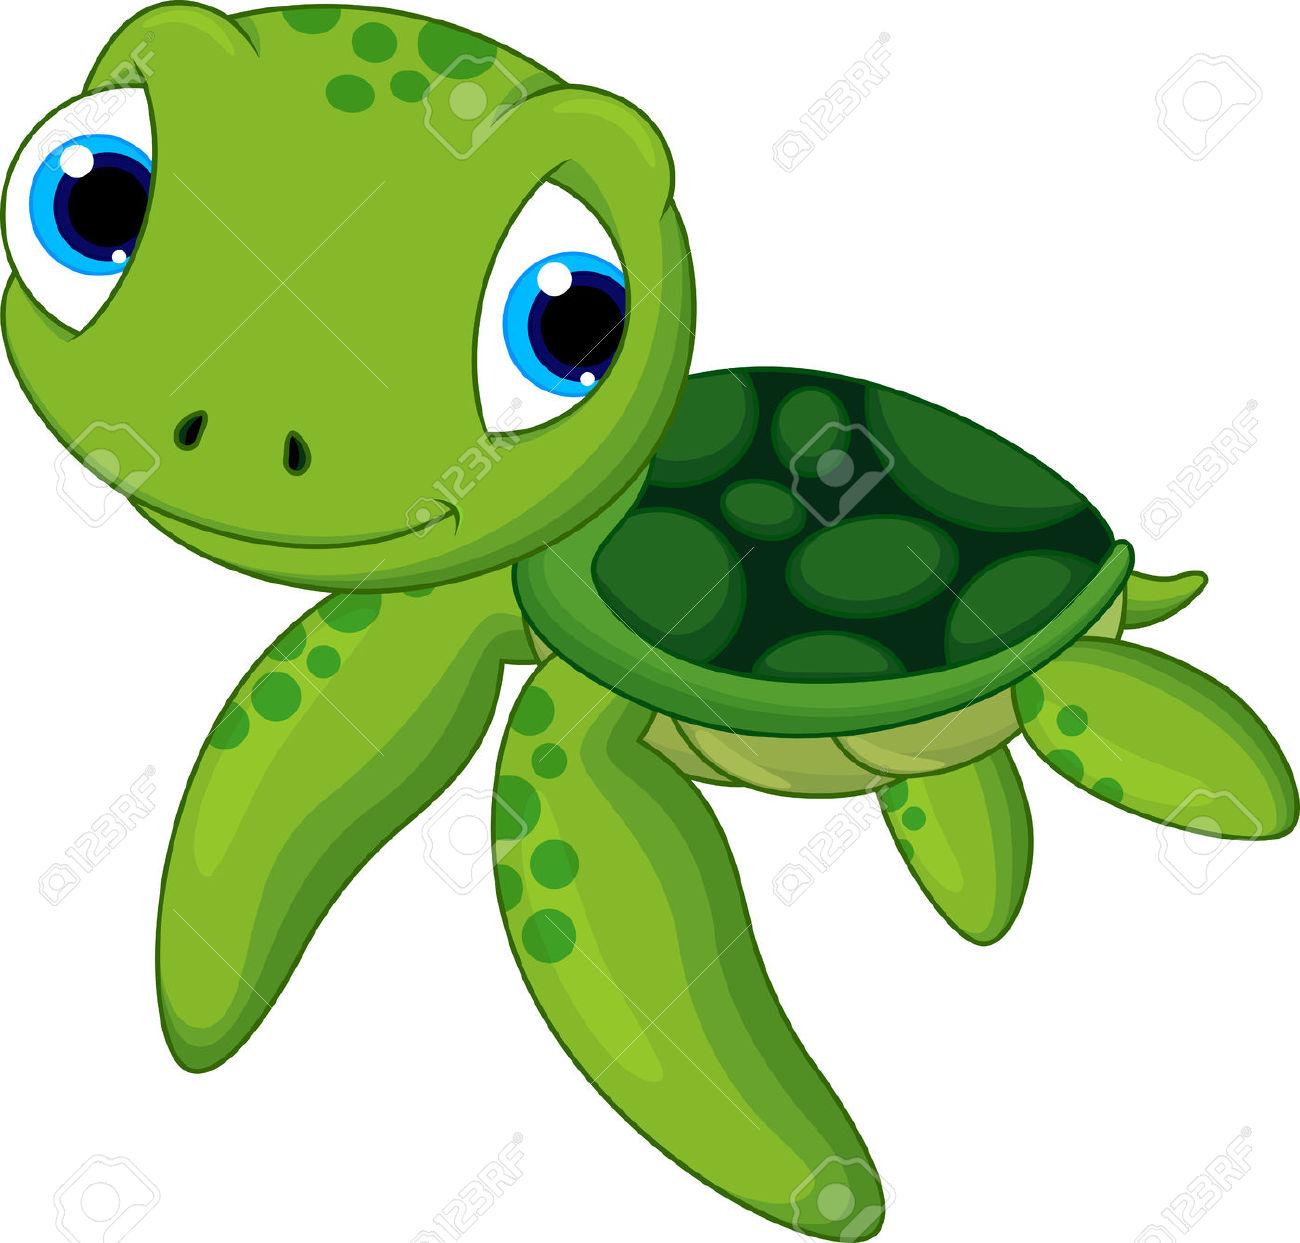 Marine Life clipart green turtle Sea clipart Sea Sea clipart